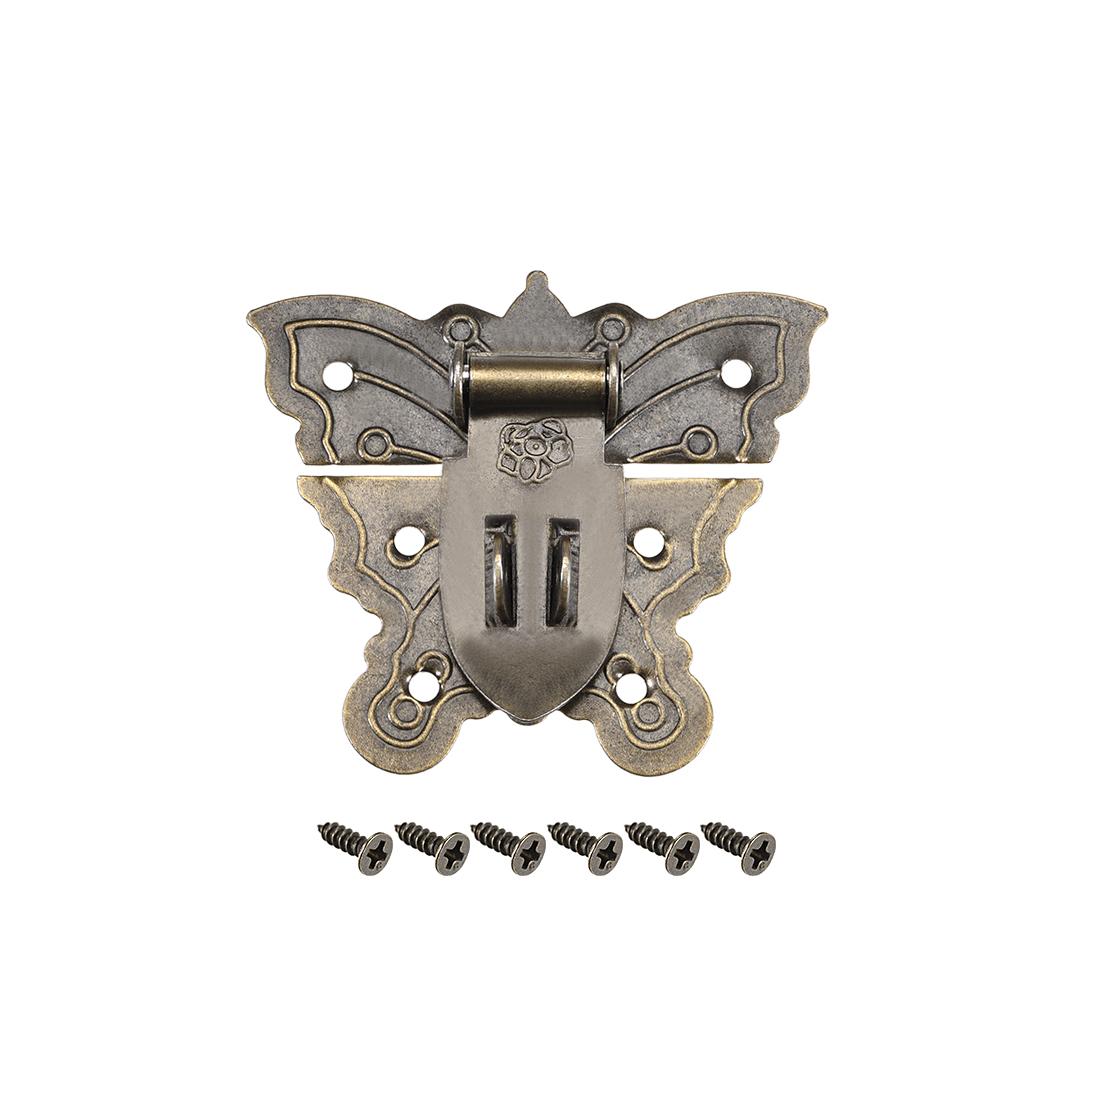 Wood Case Box Butterfly Hasp 60x51mm Antique Latches Hook Bronze Tone, 3 Pcs